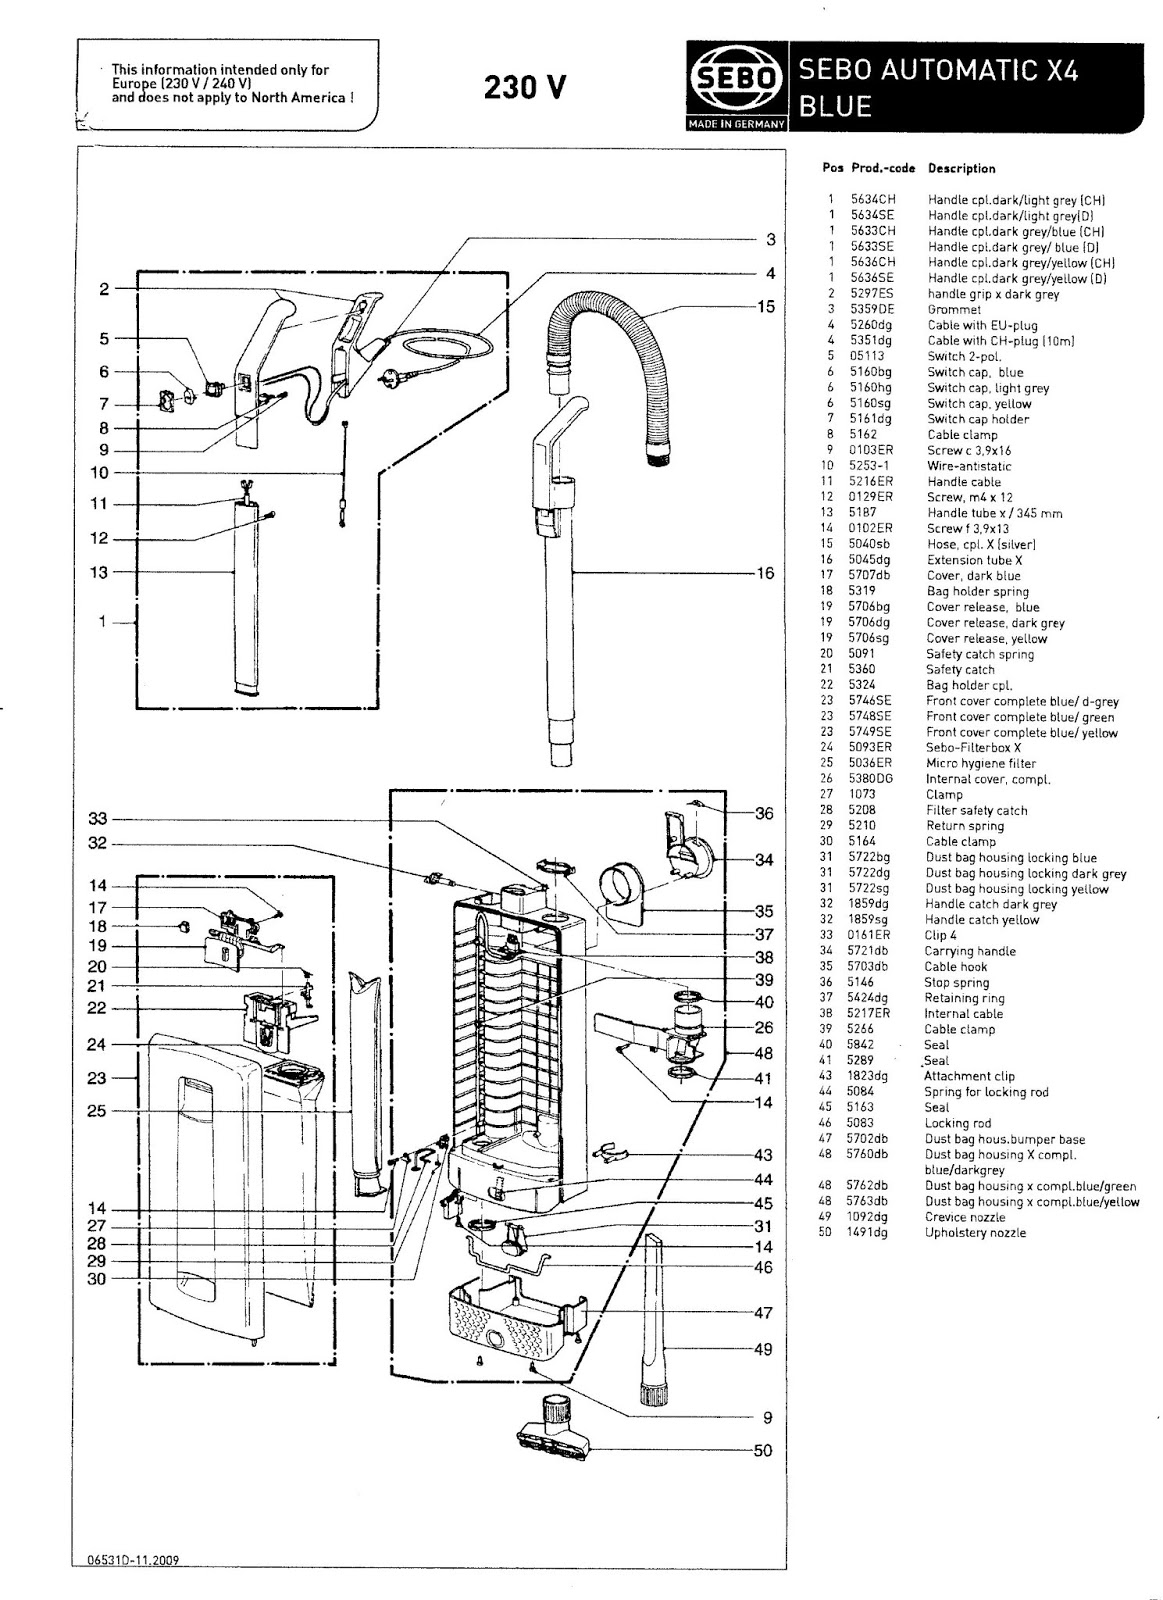 Sebo Automatic X4 Parts Manual Exploded Diagram